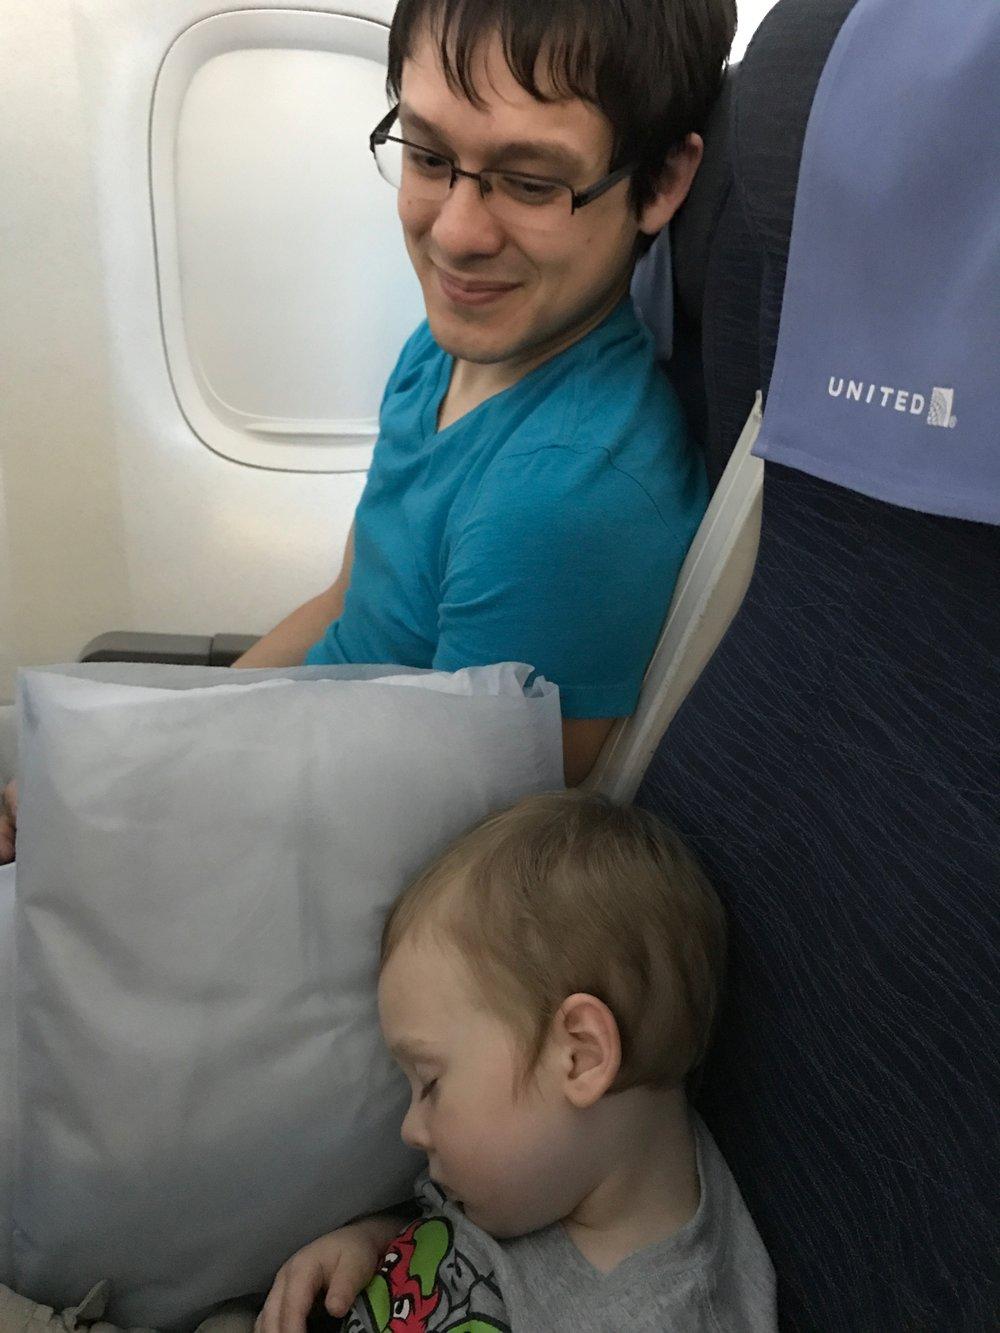 - Sleepy traveler.